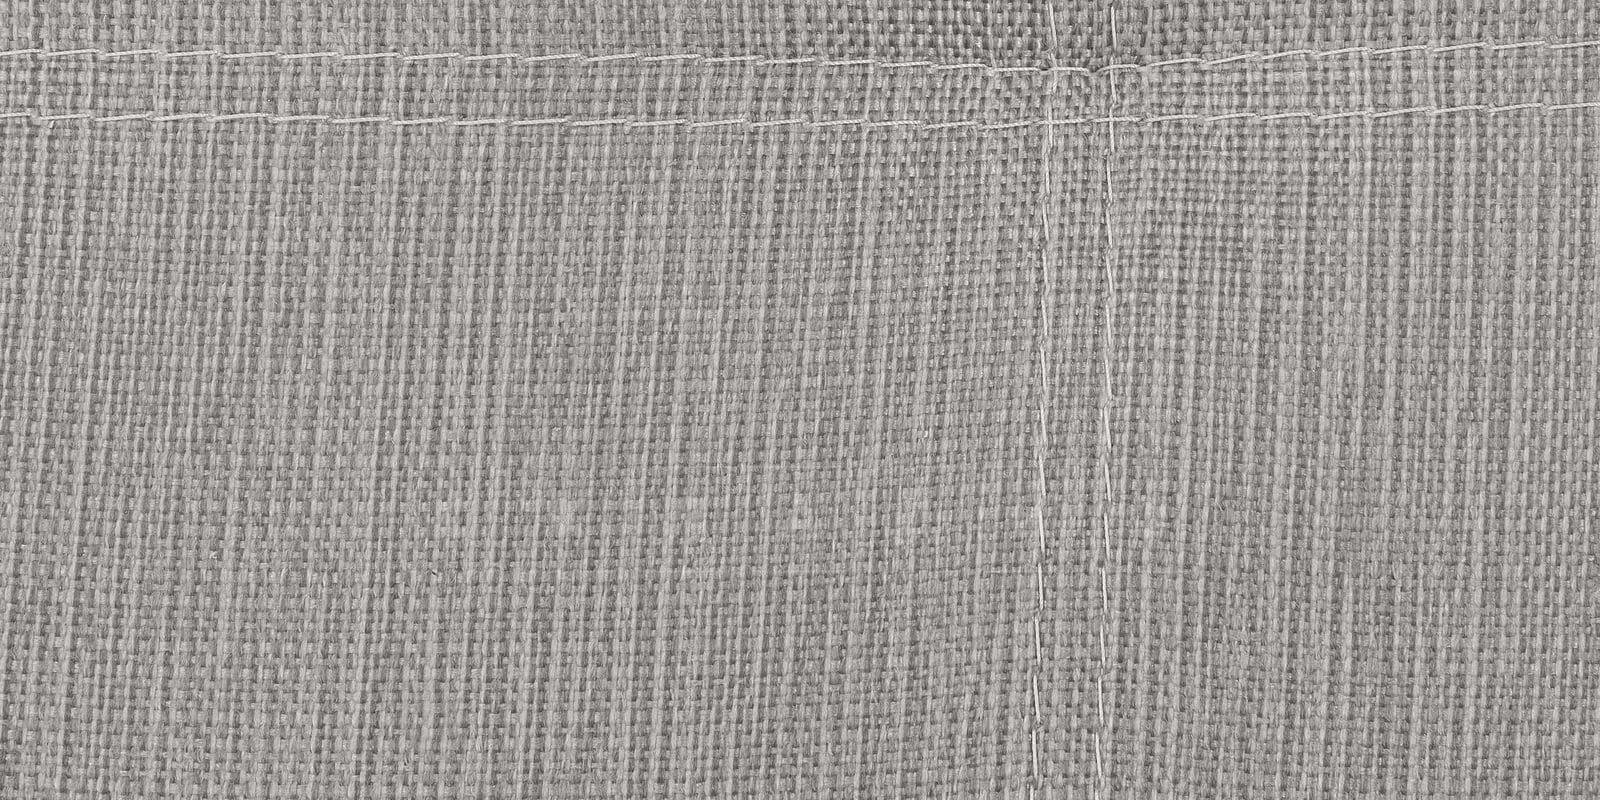 Диван Атланта рогожка серого цвета фото 8 | интернет-магазин Складно